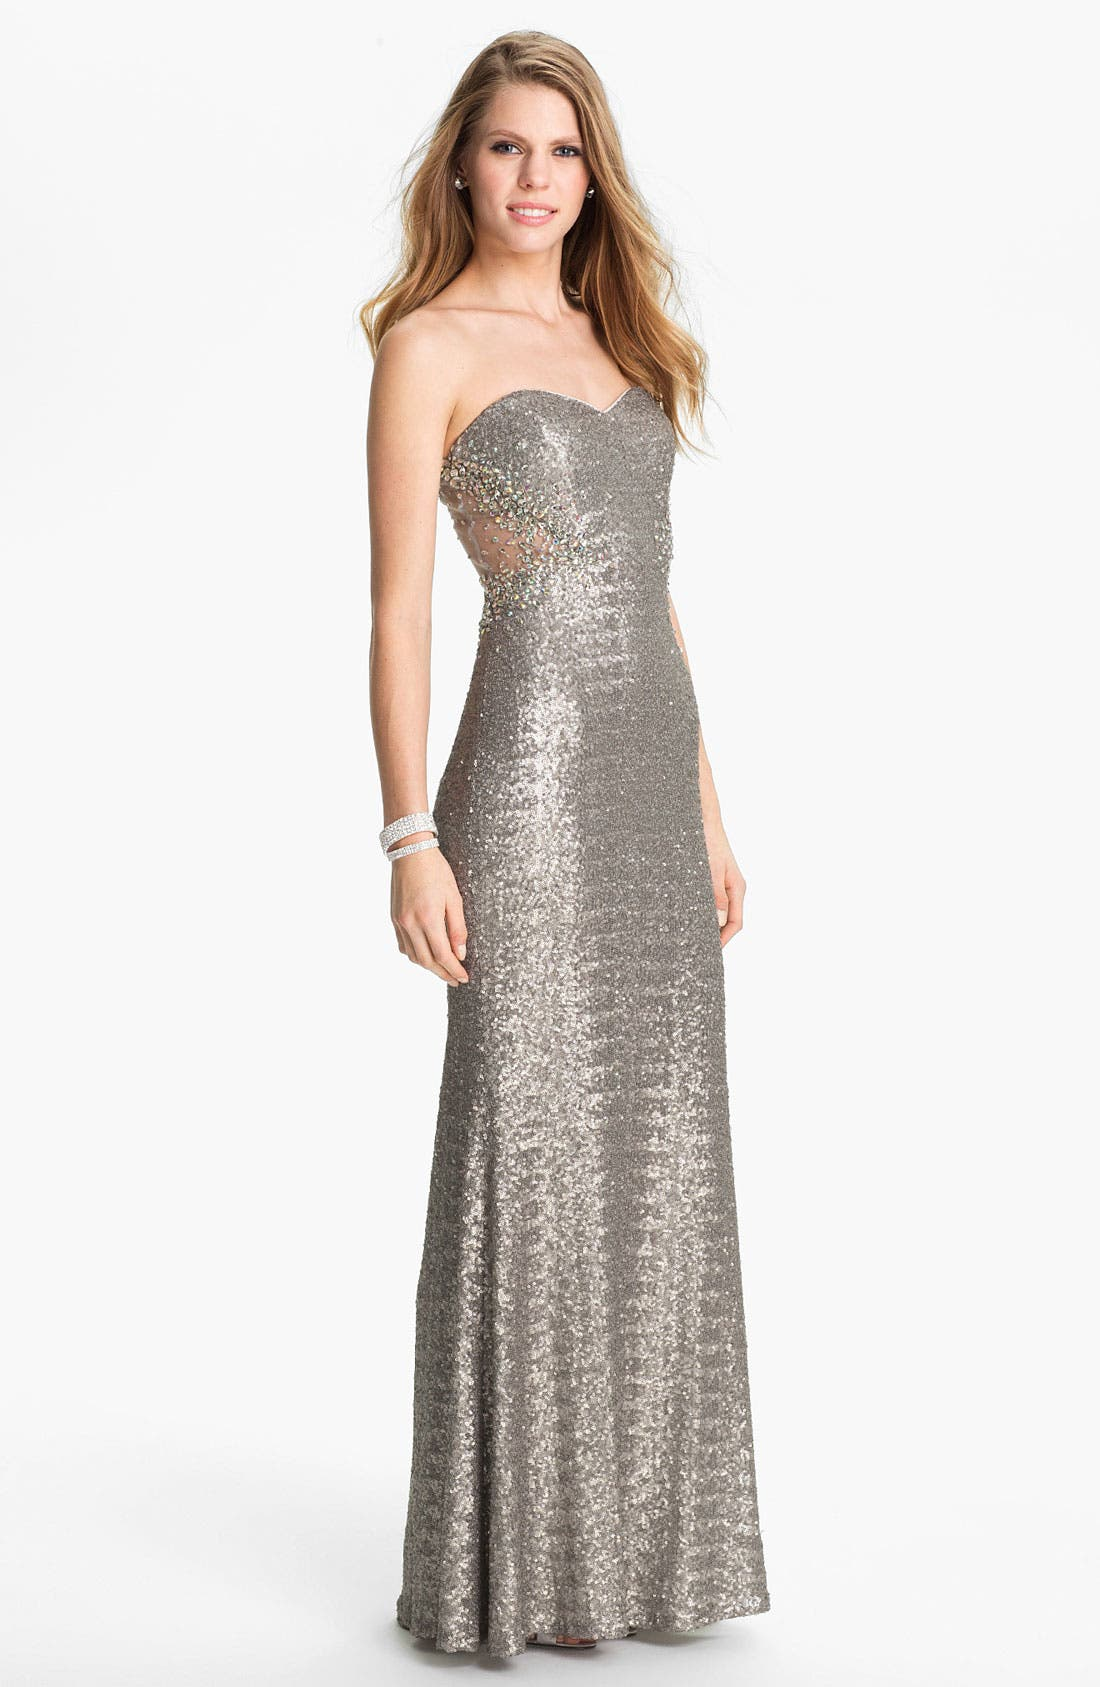 Alternate Image 1 Selected - La Femme Metallic Sweetheart Gown